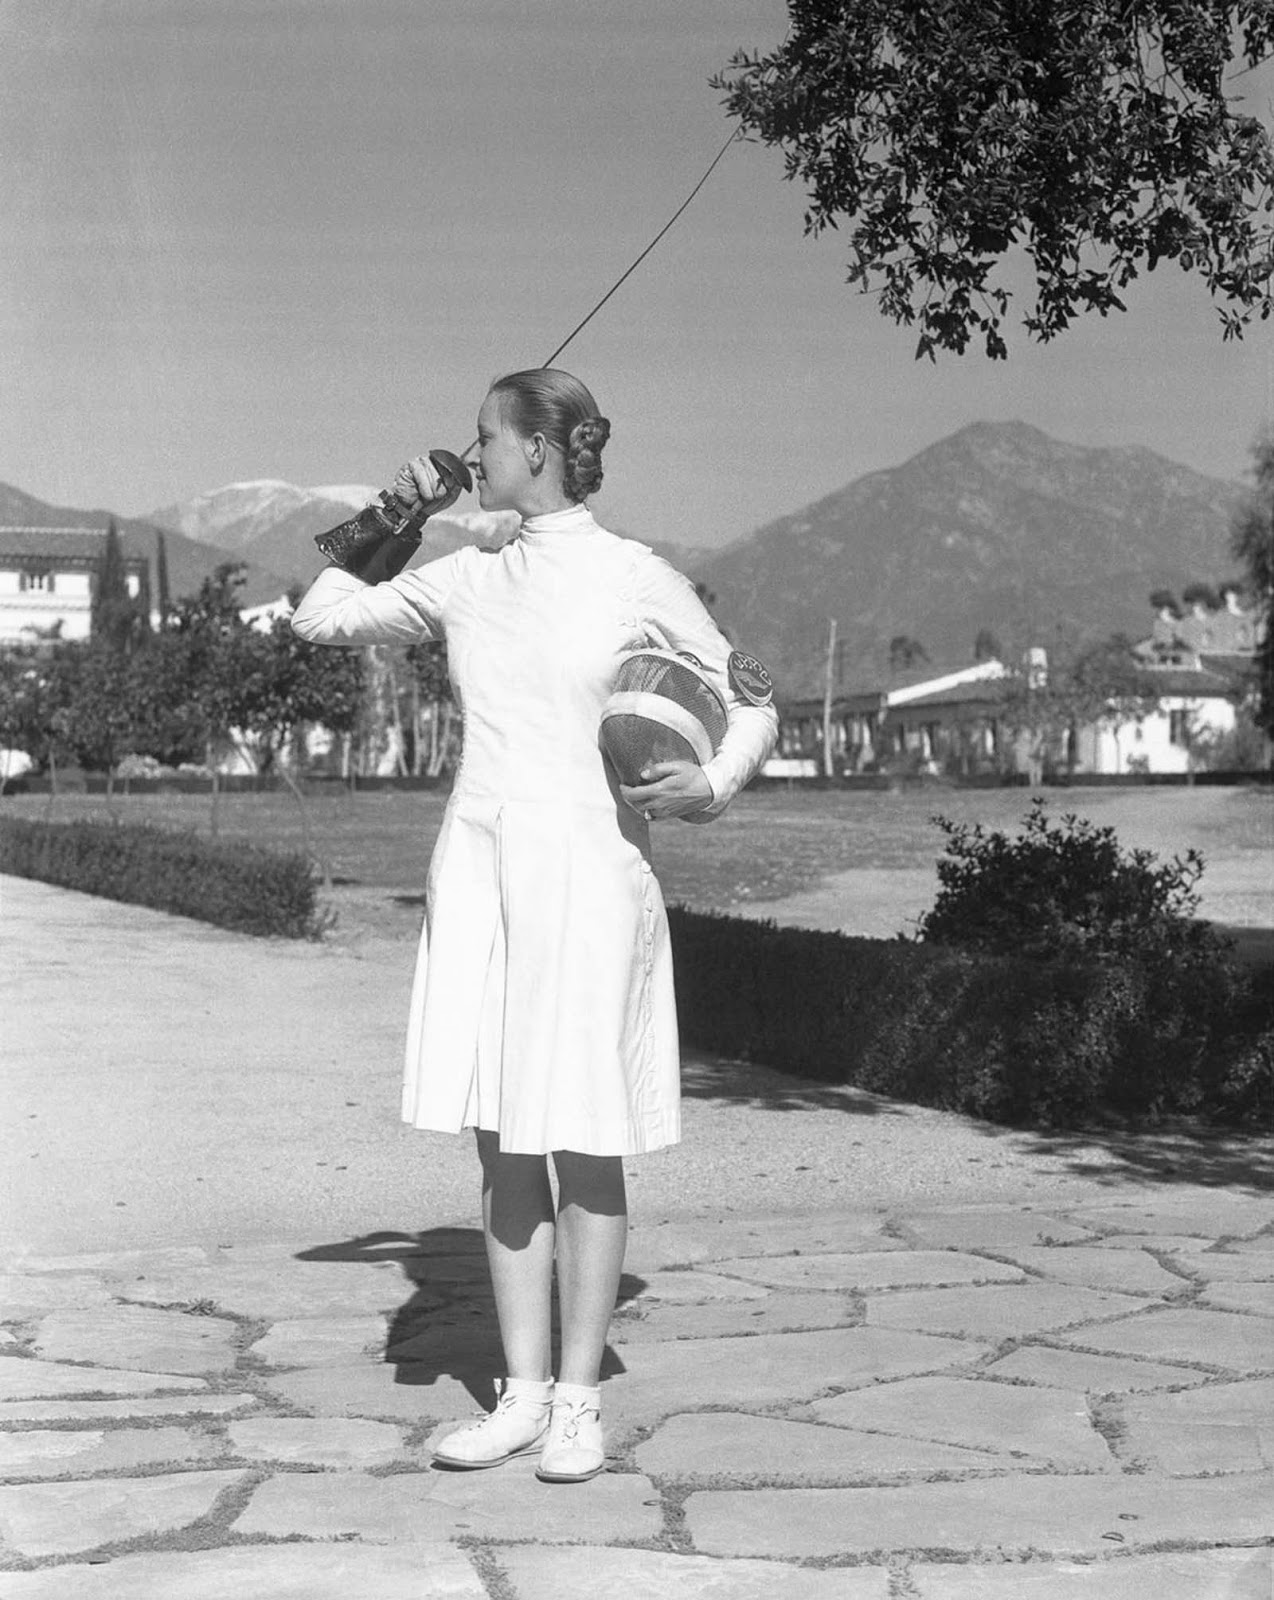 In California. 1934.